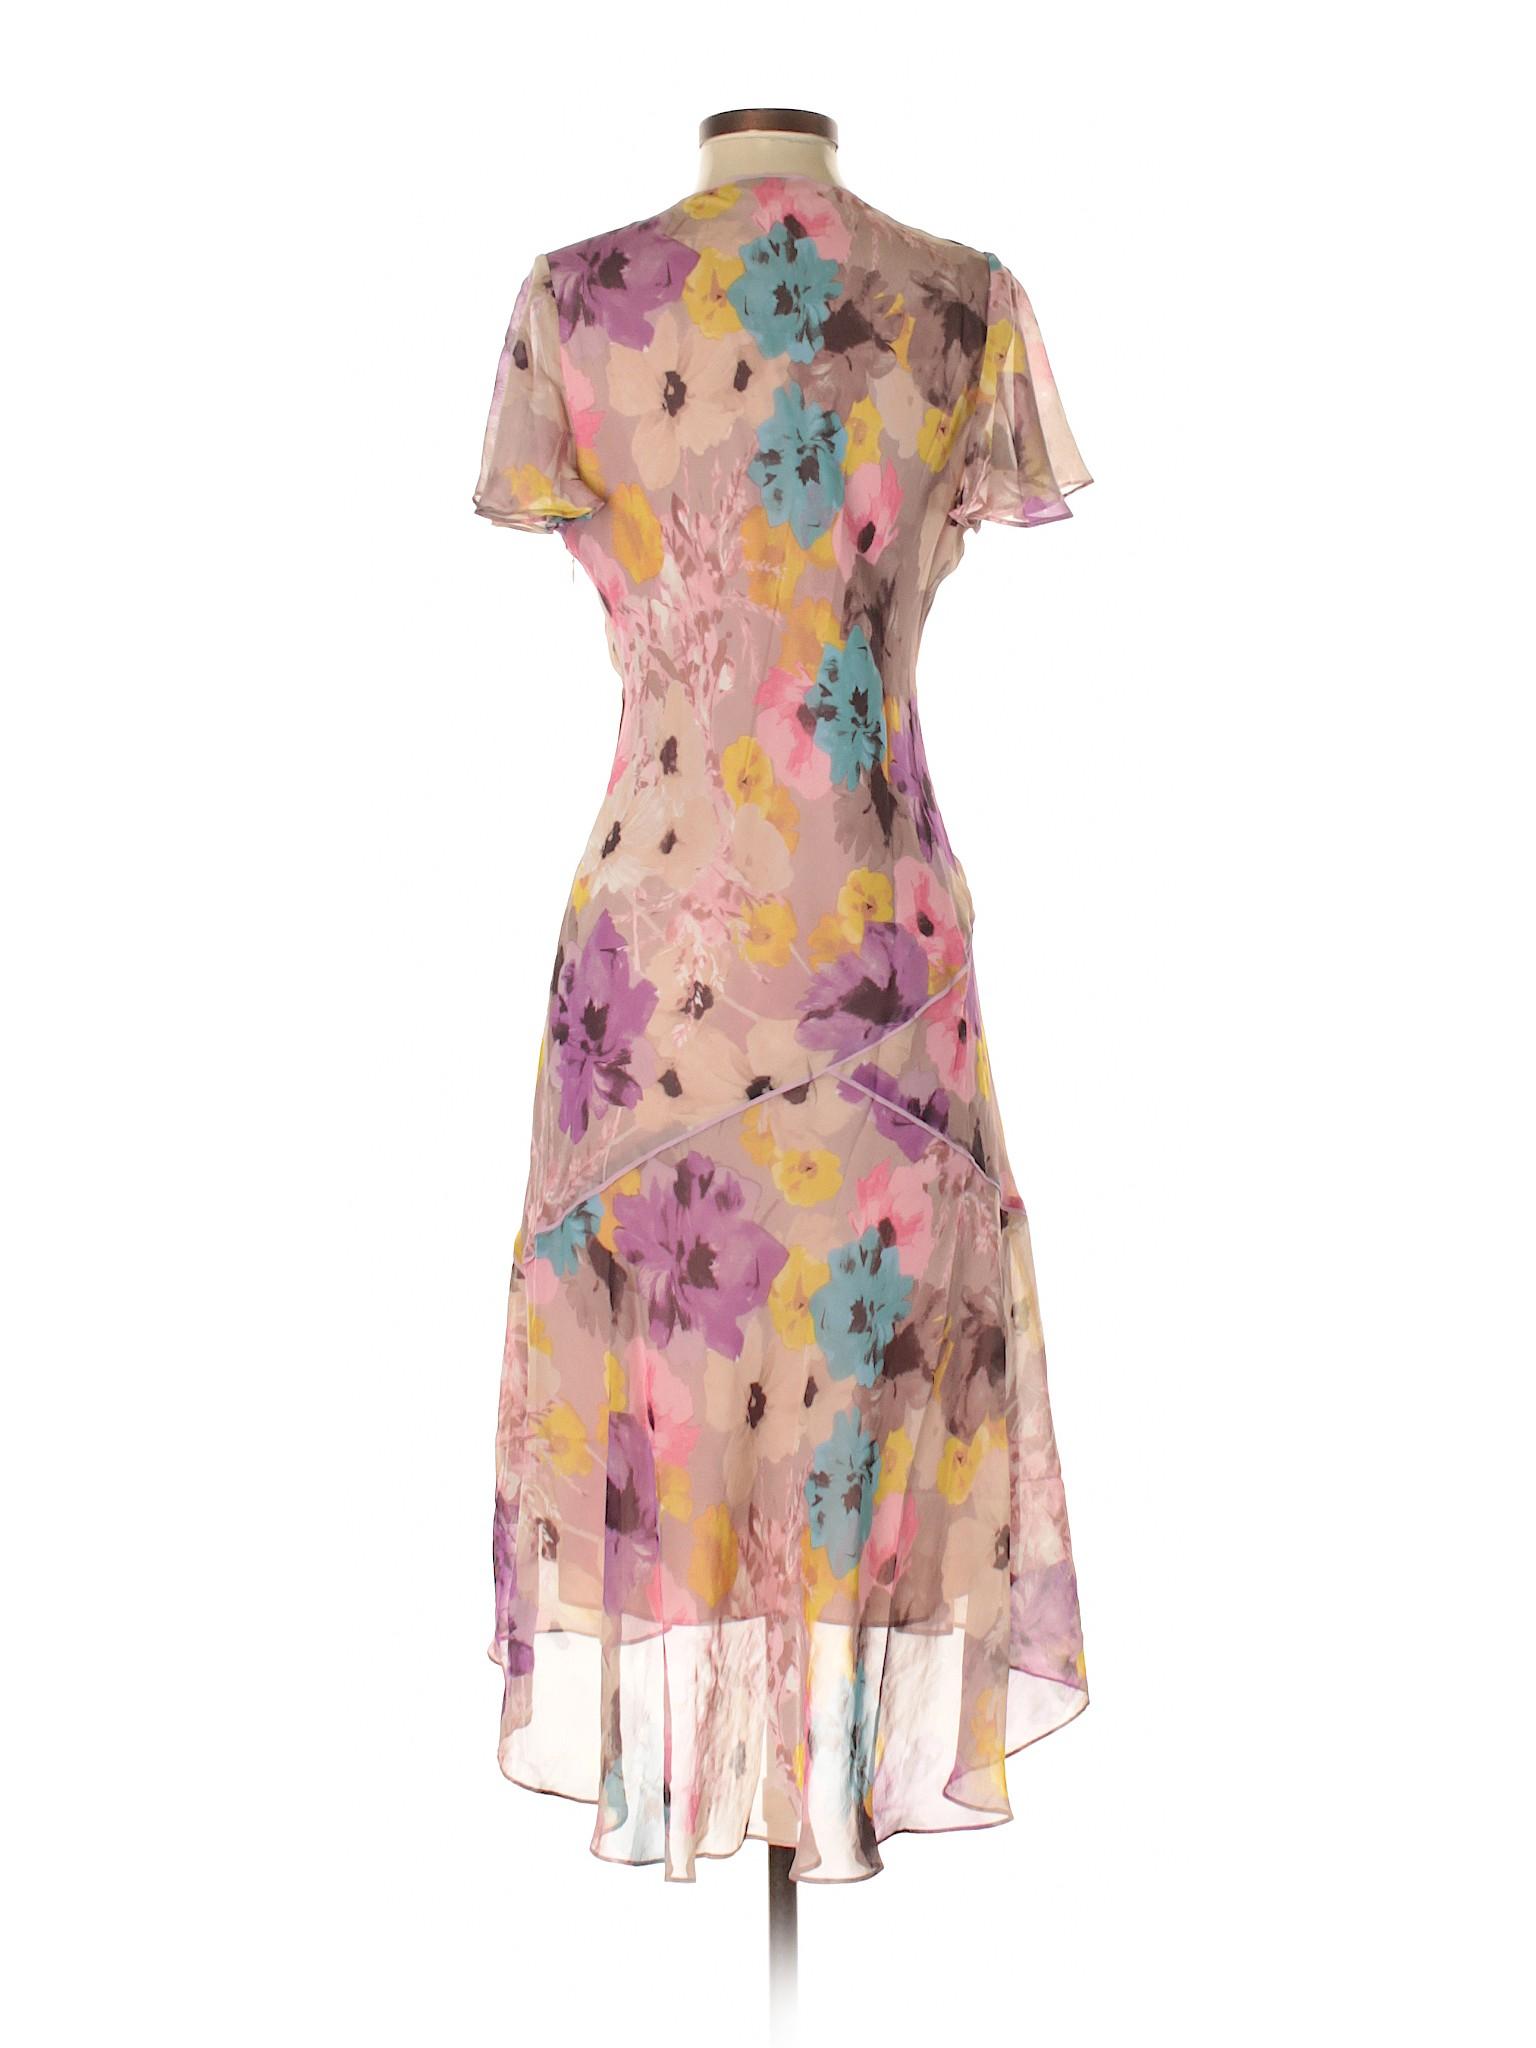 Boutique Casual Sundance winter Boutique Dress winter qwZ6vv5I